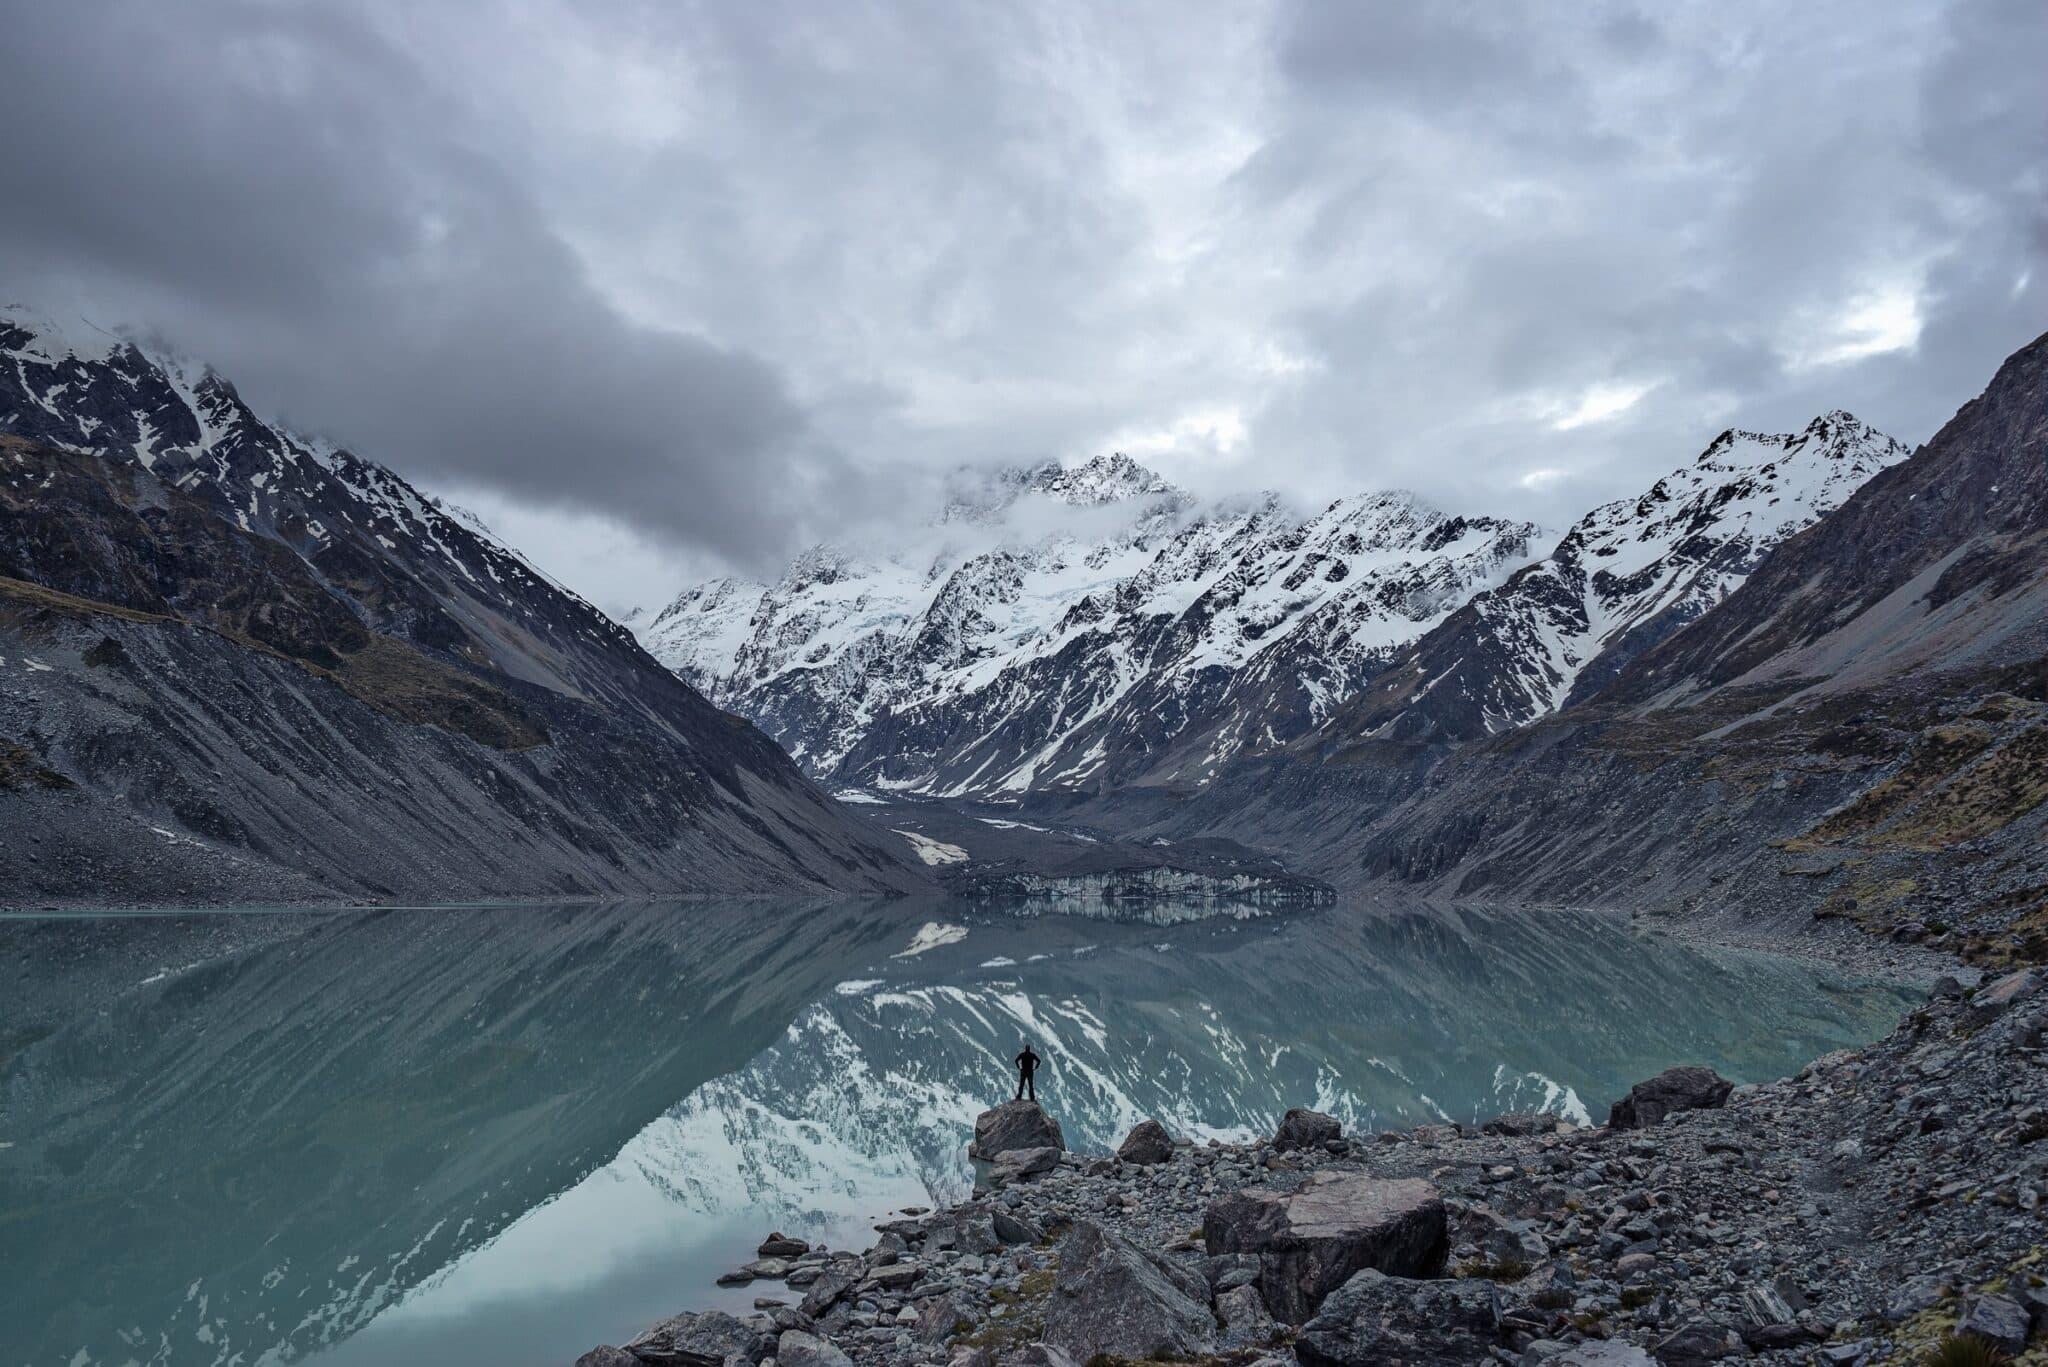 Mountains and lake